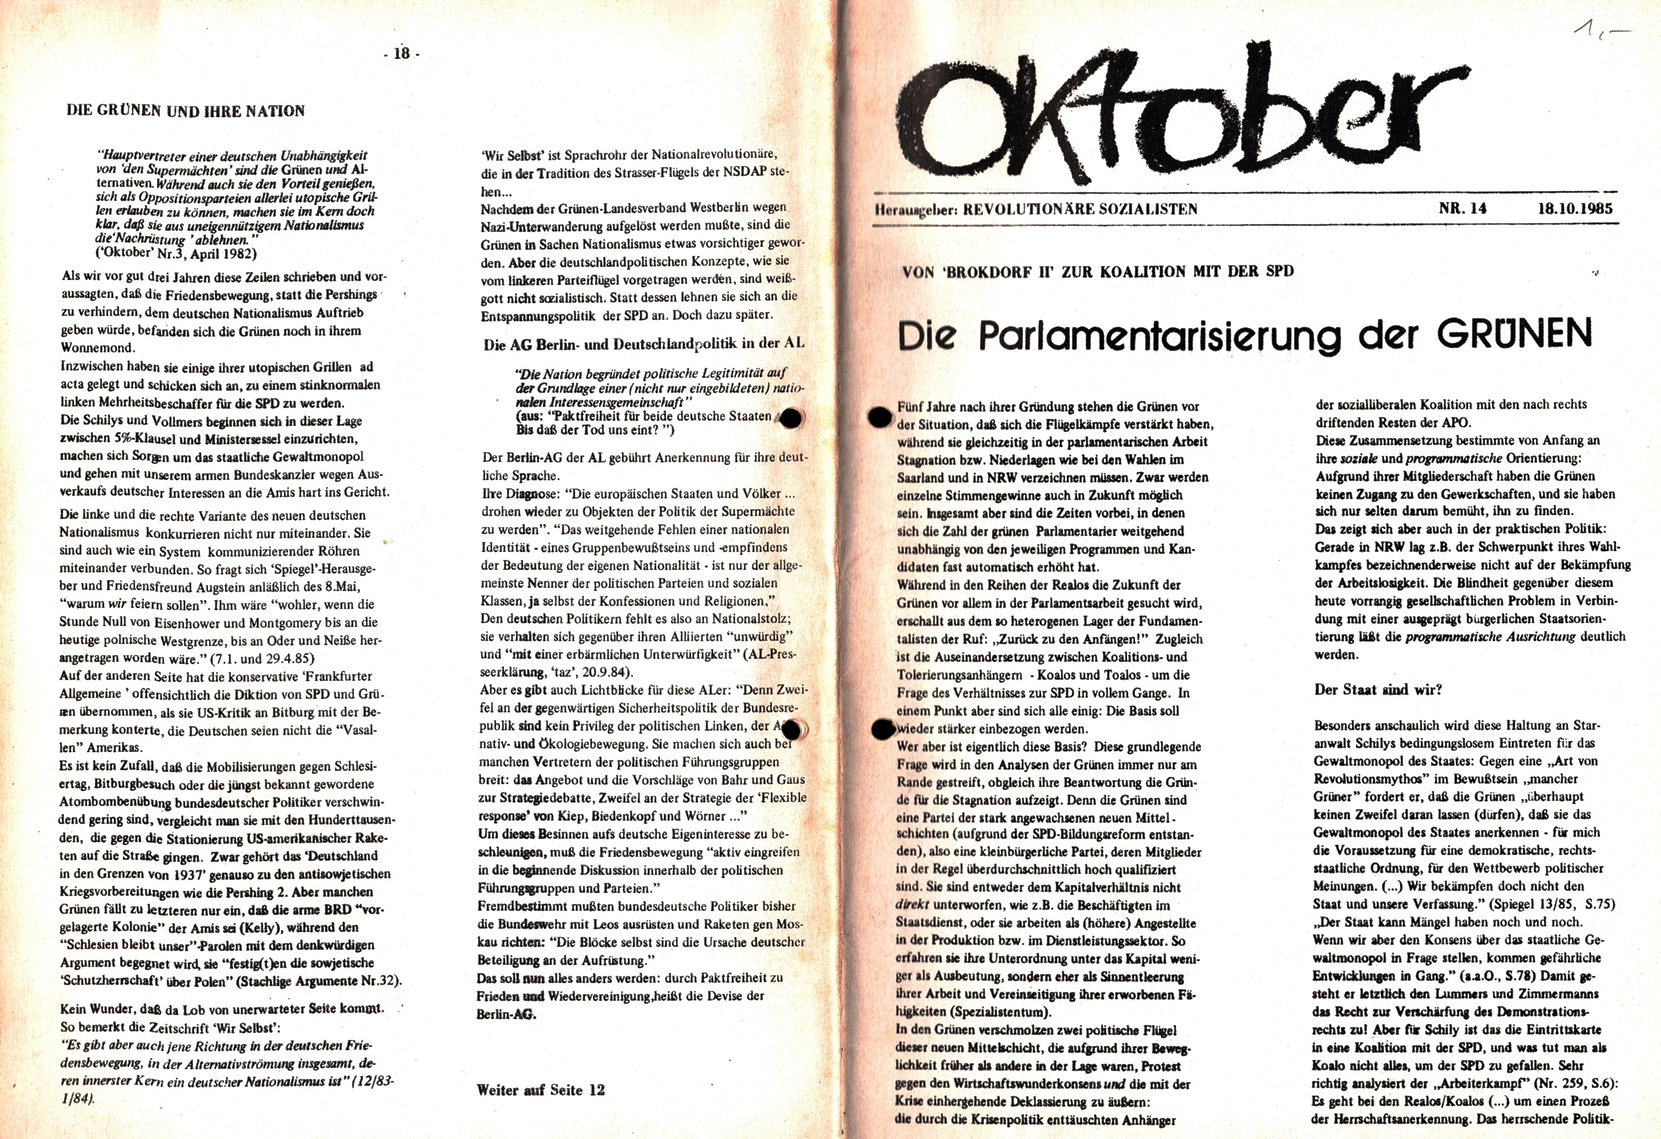 BER_IKW_Oktober_19851018_014_001